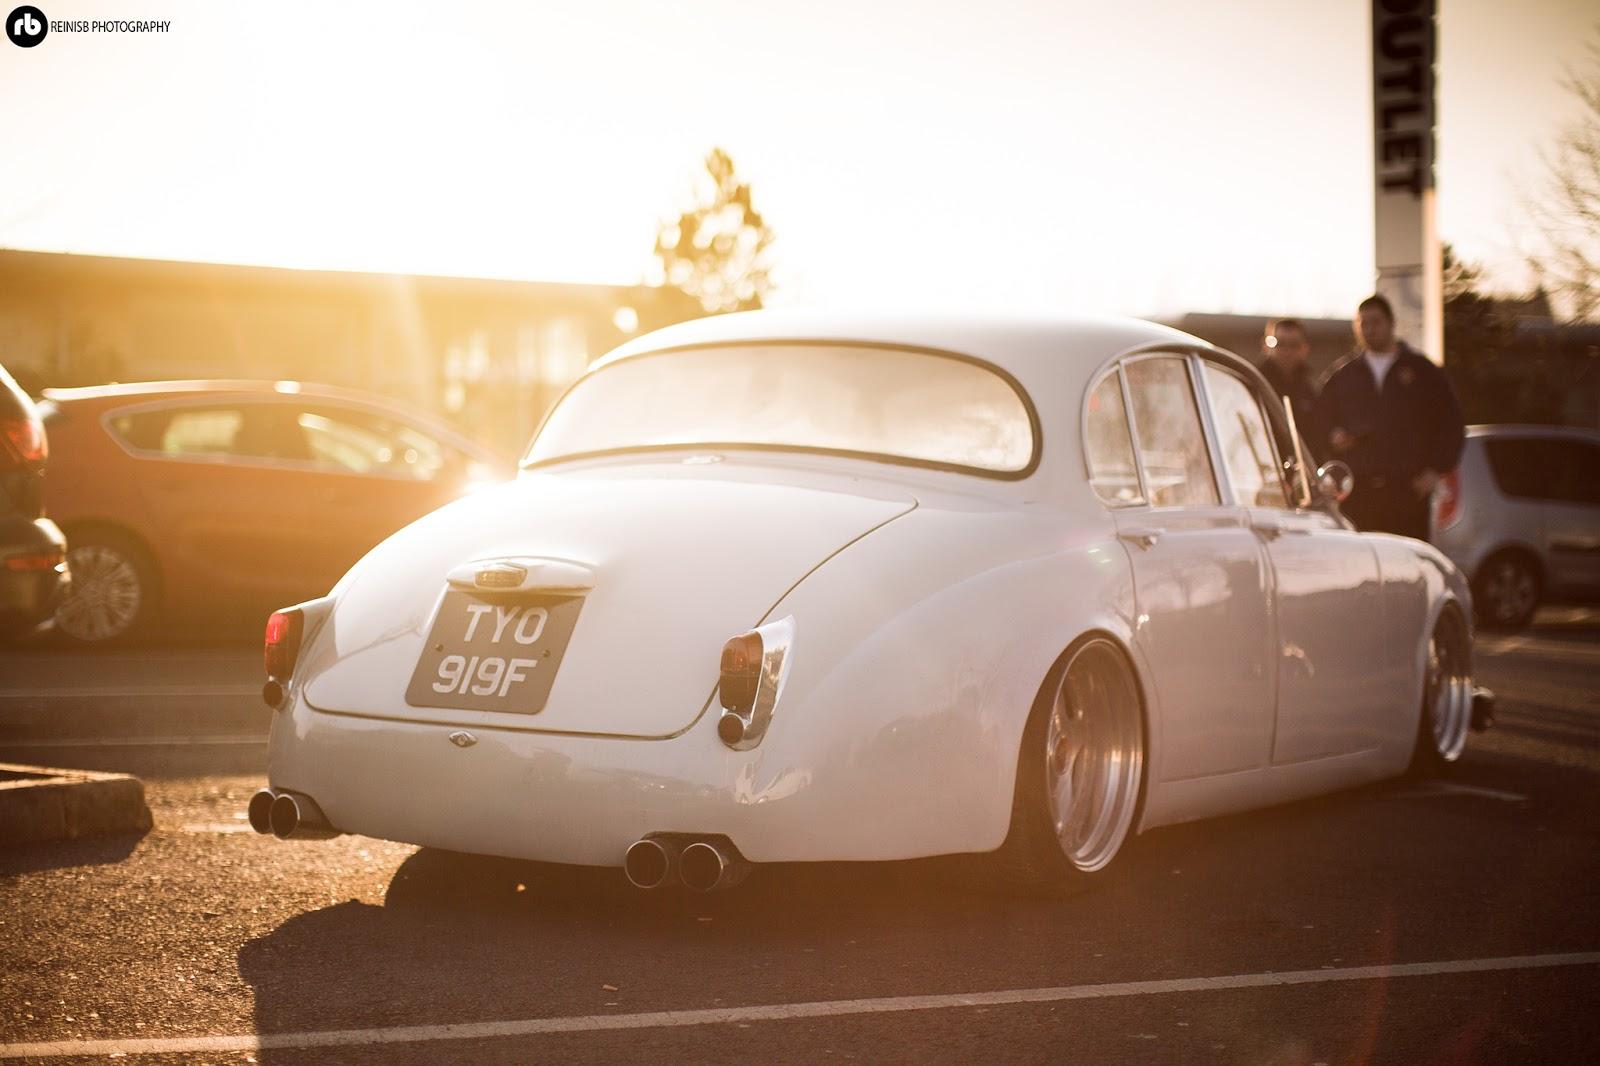 Reinis Babrovskis Photography: Autolifers Cars & Coffee